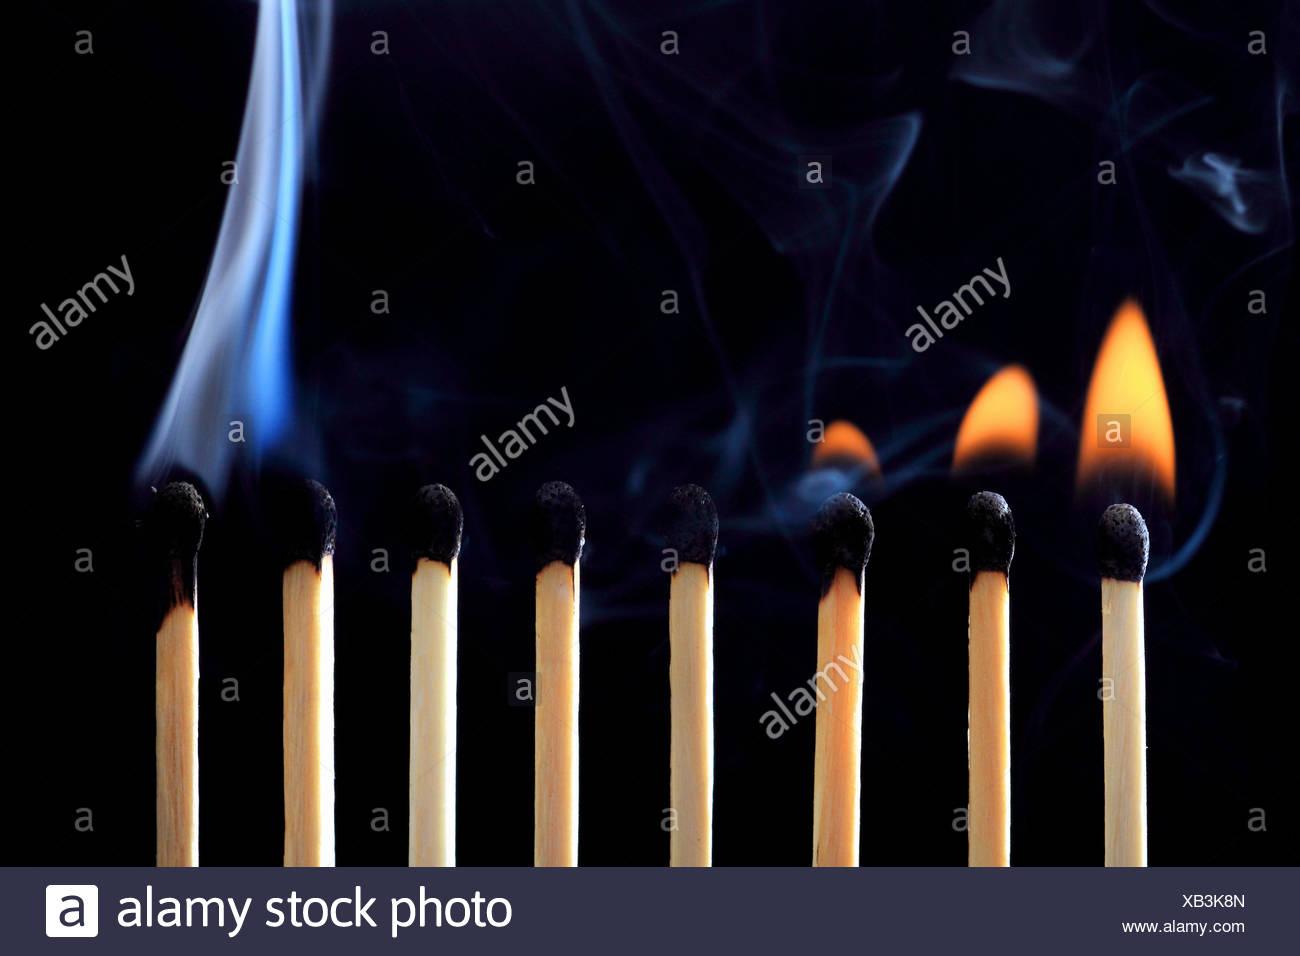 fire matches stock photos